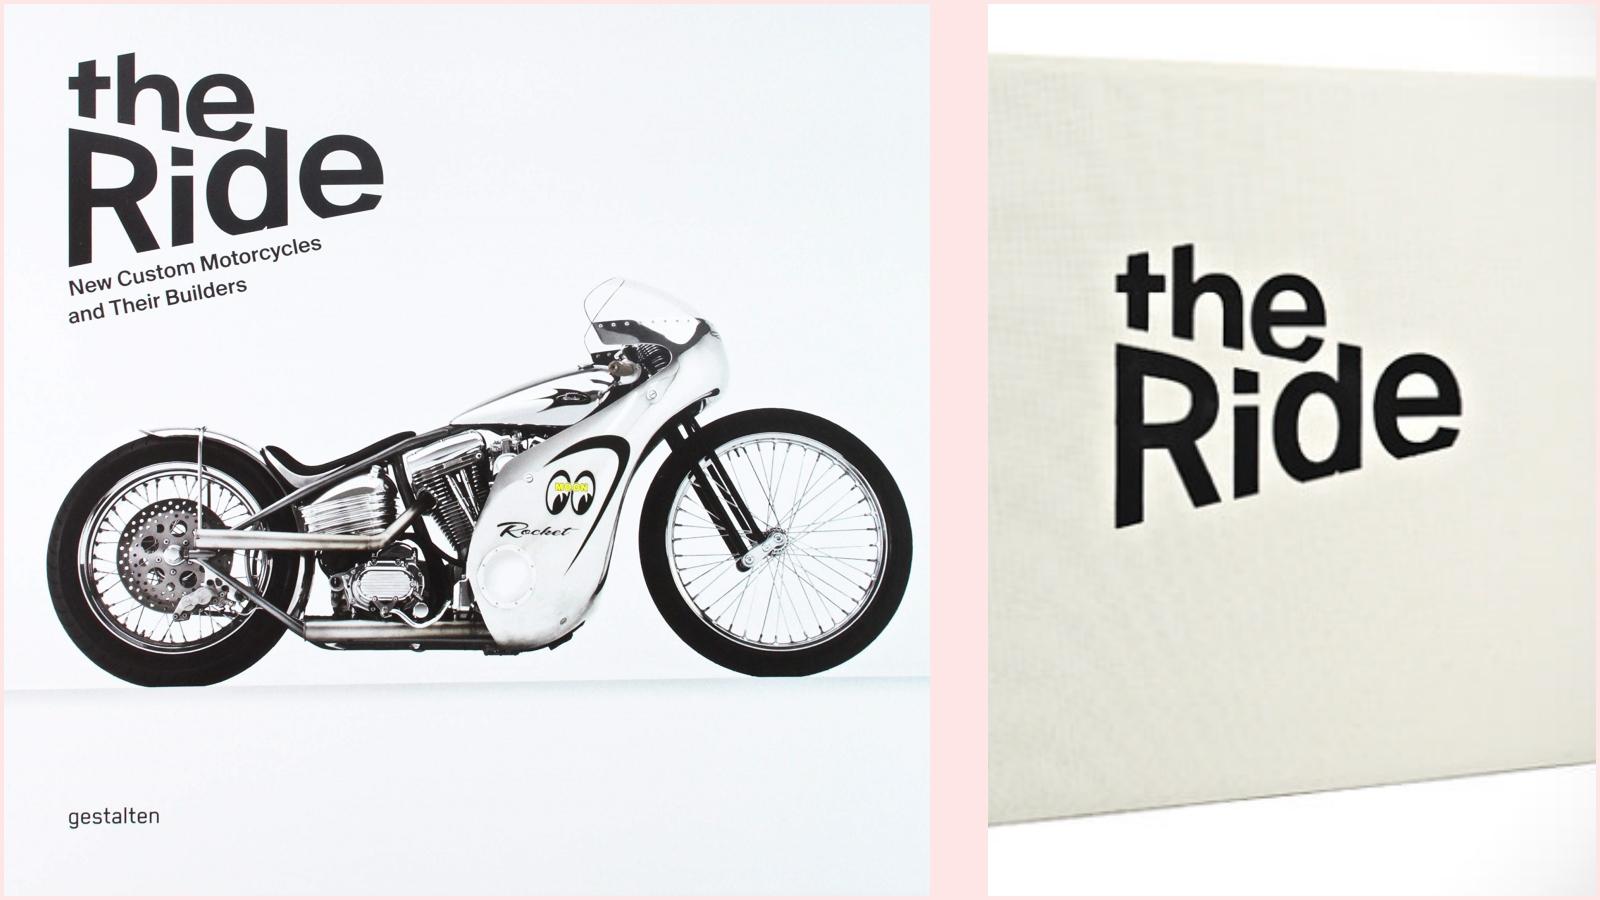 The Ride: New Custom Motorcycles and Their Builders / Chris Hunter y Robert Klanten